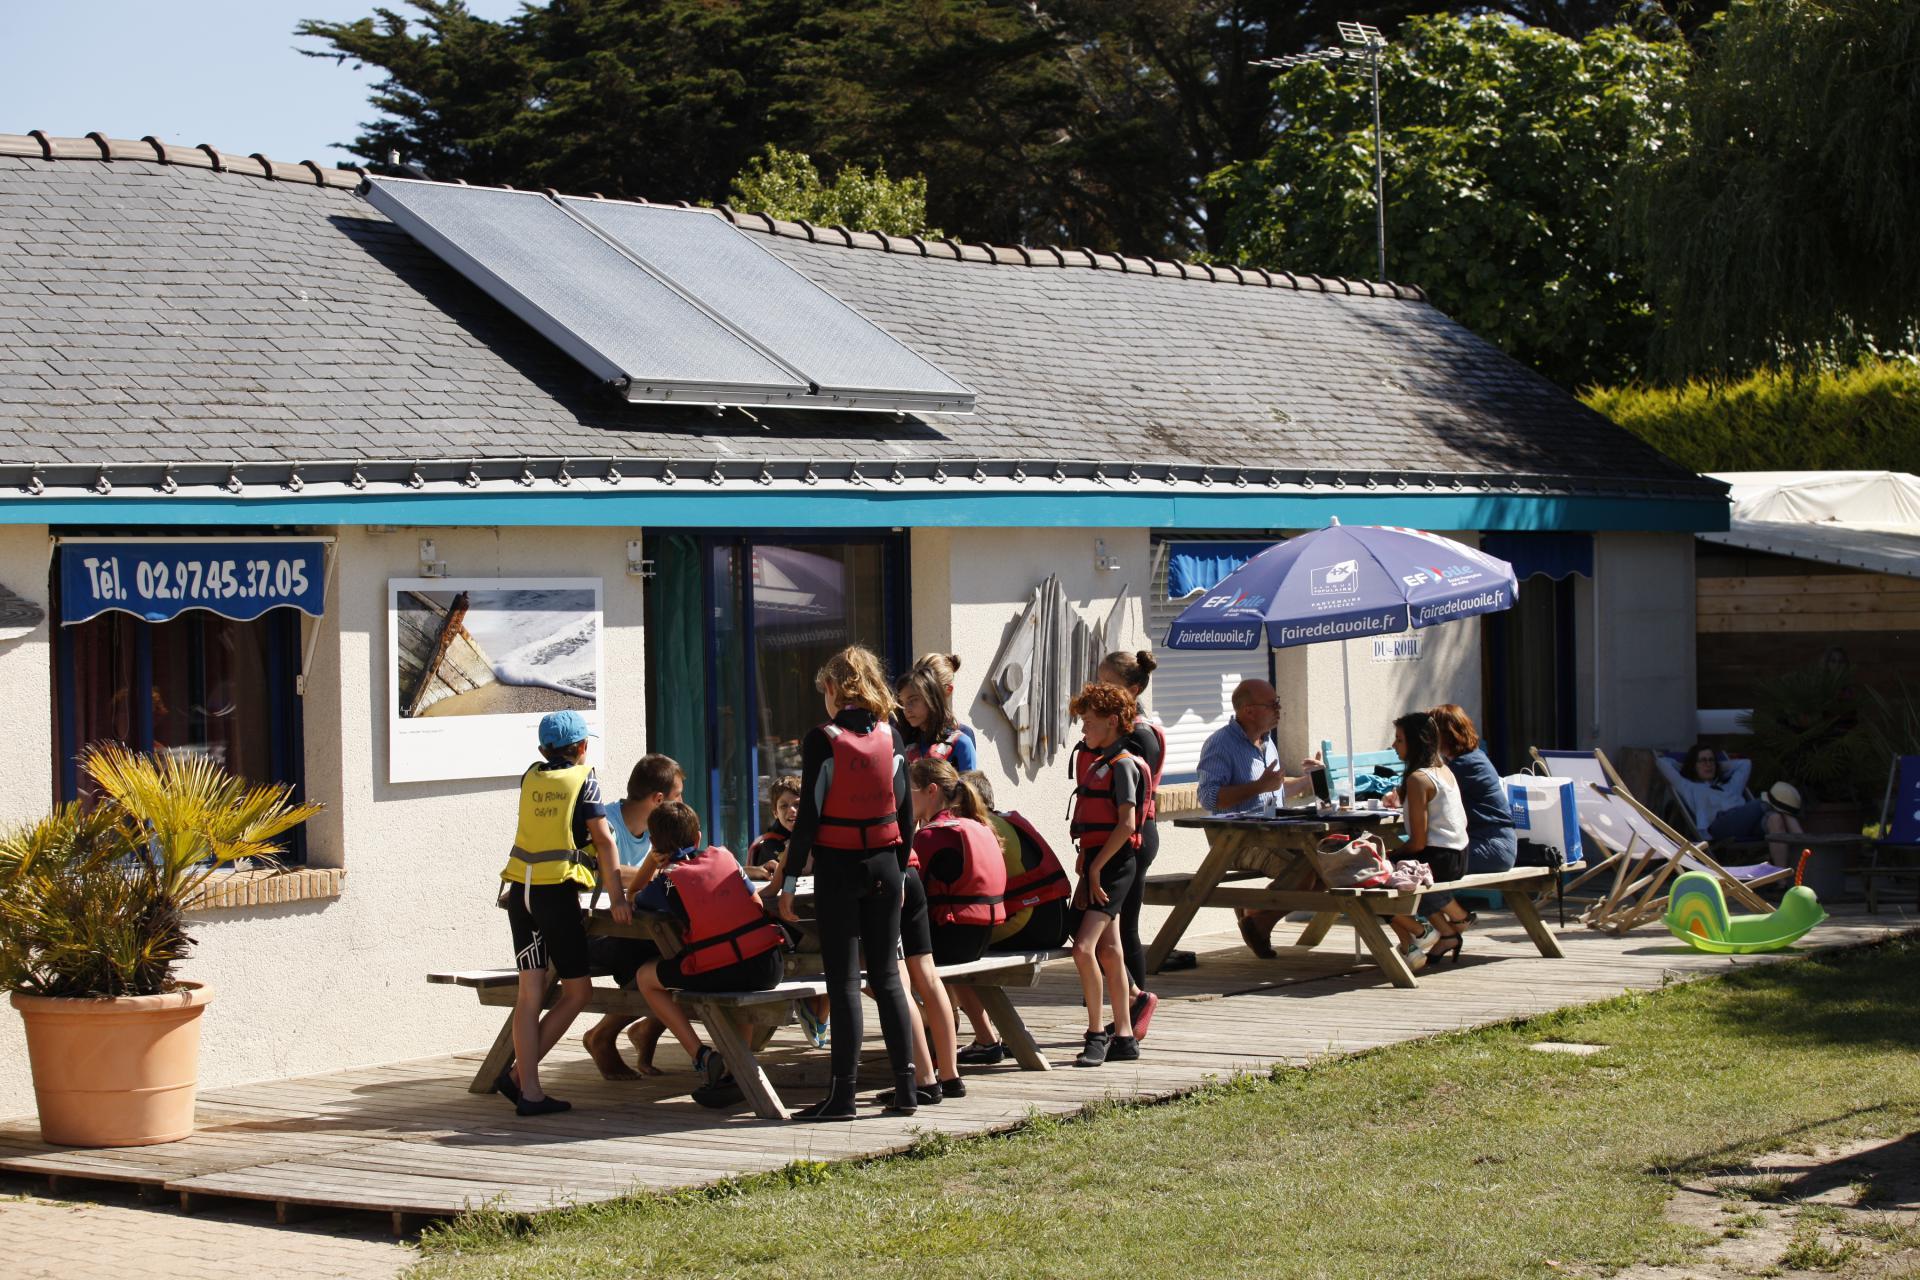 Club Nautique du Rohu Sailing School in Brittany (Morbihan)